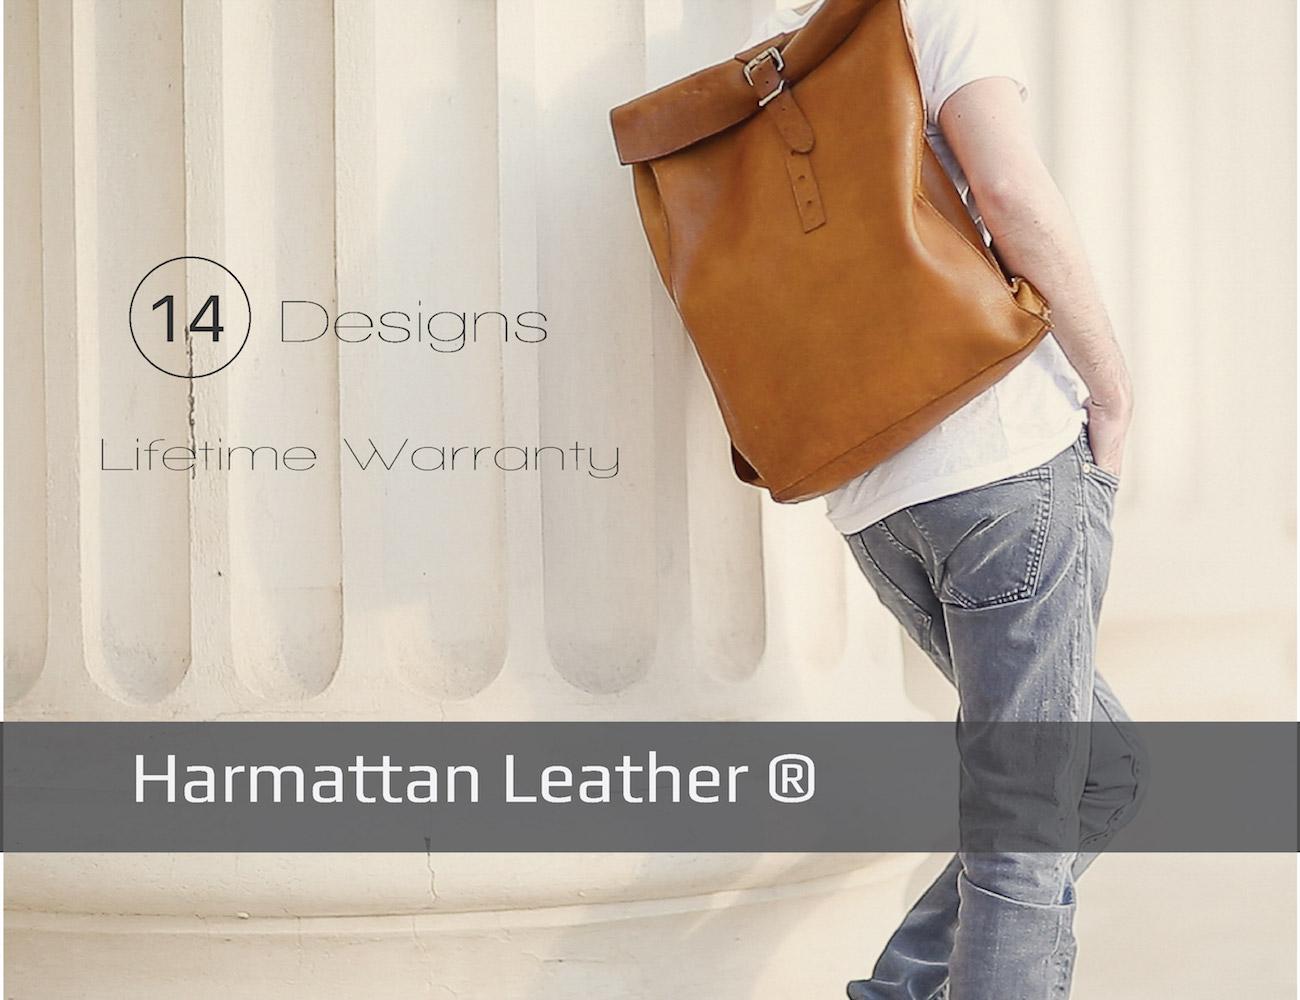 harmattan-leather-03